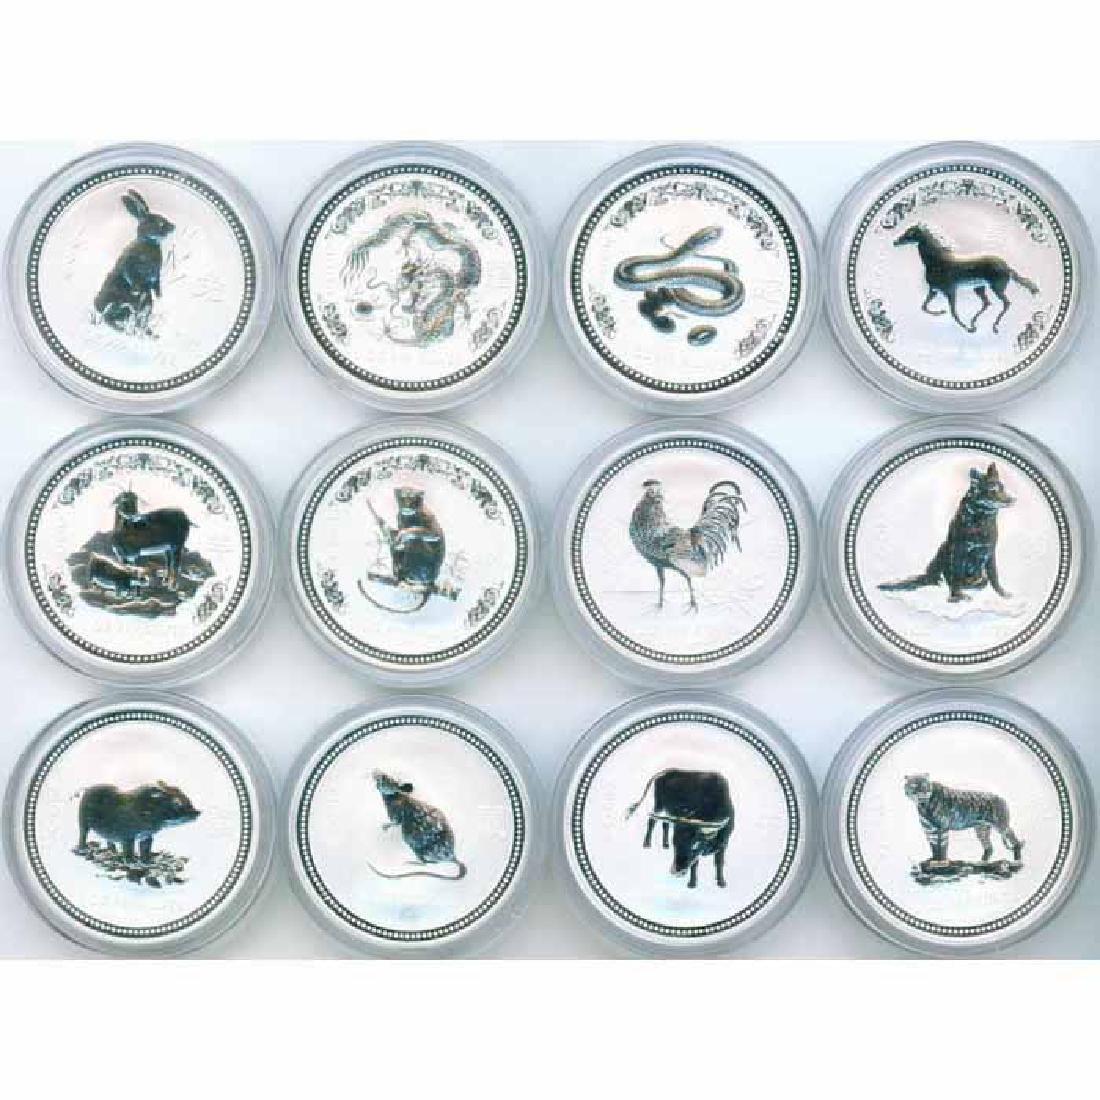 Australia Lunar 1 oz. Silver 12 pc. Set With Box